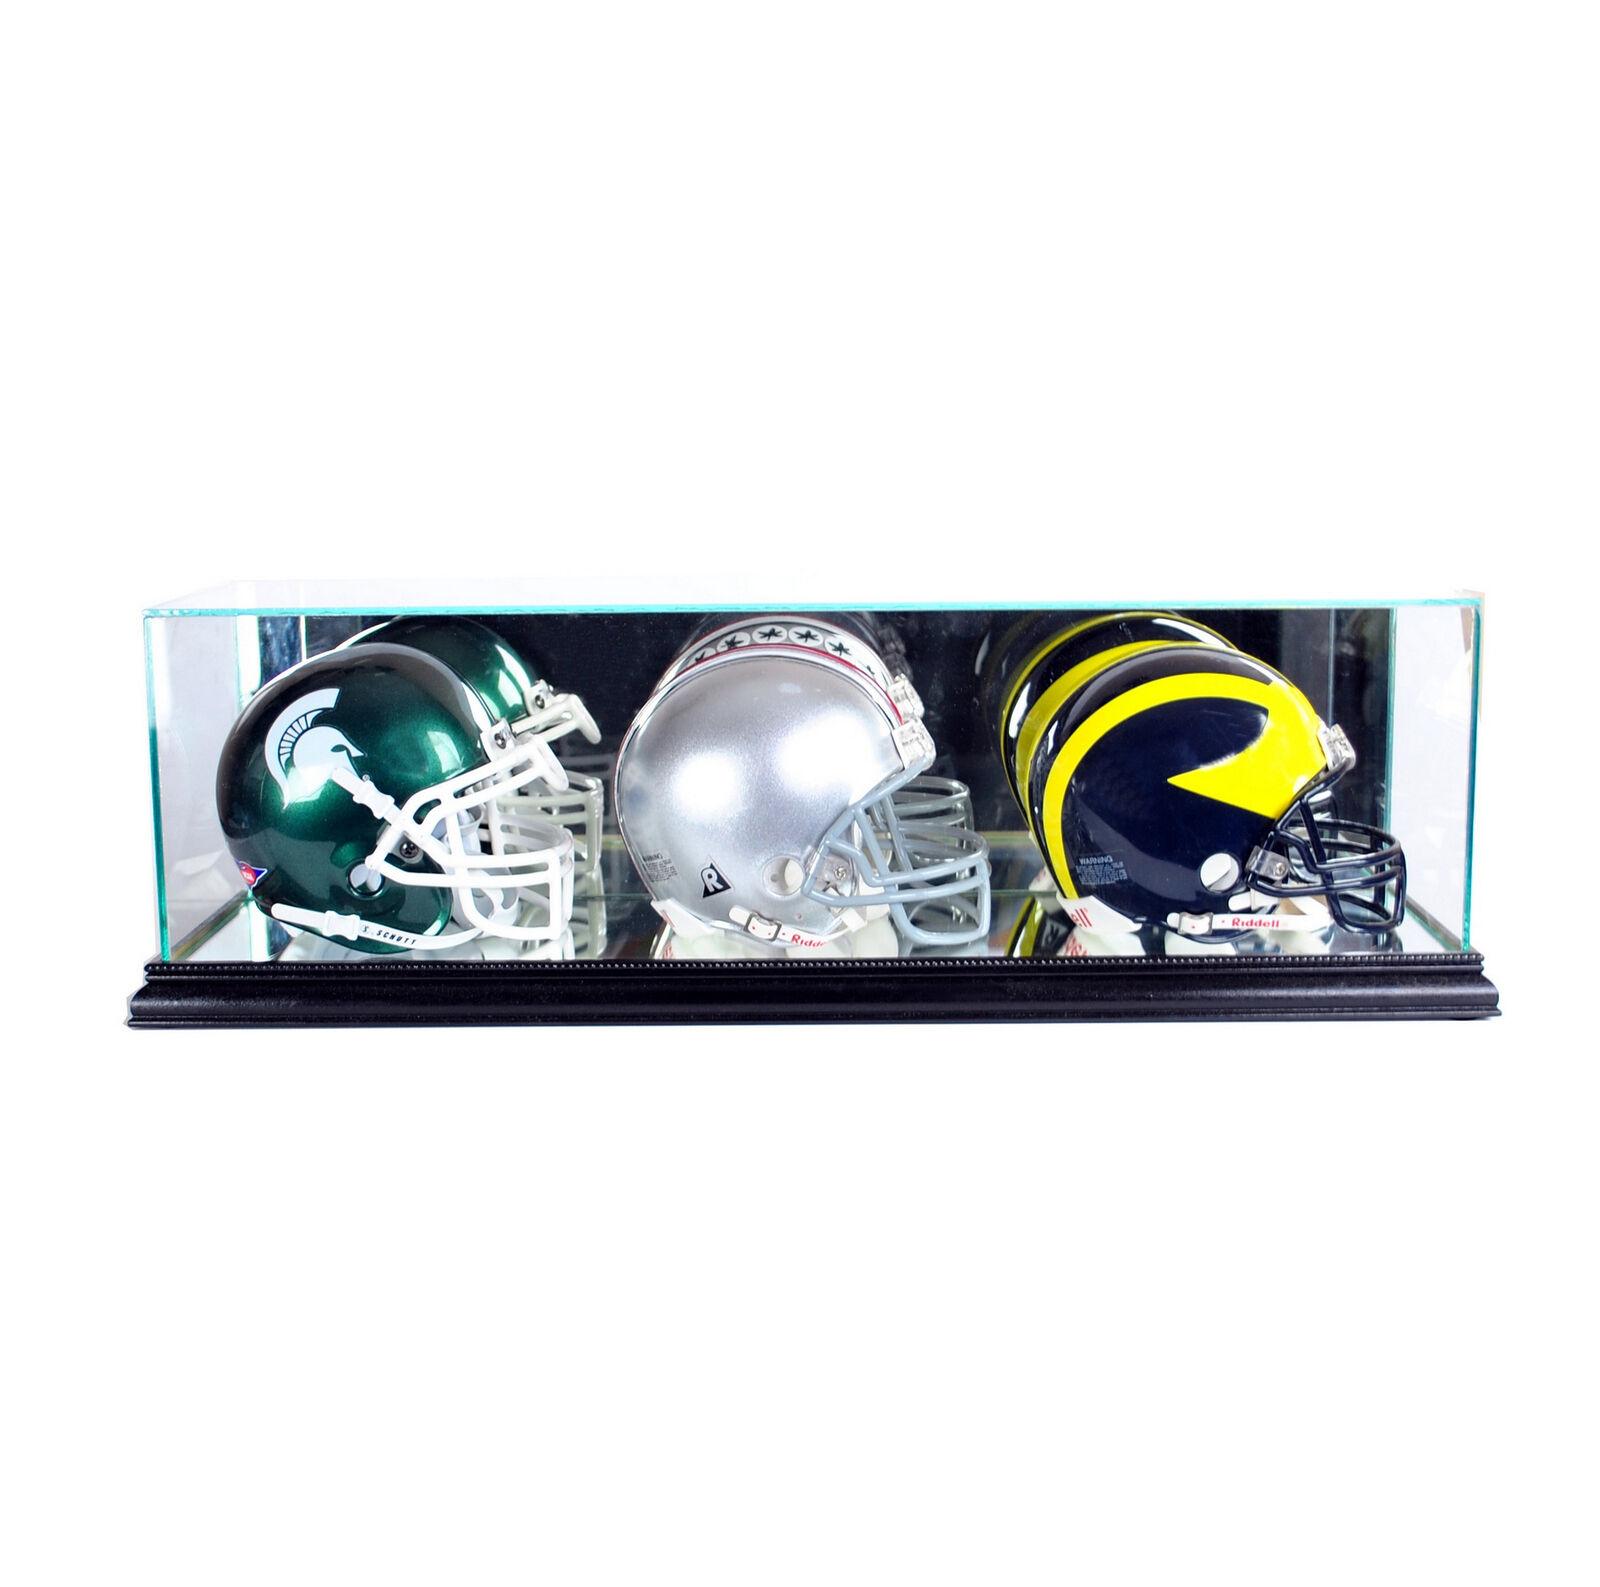 Display Cases New Denver Broncos Football Helmet Display Case Black Sport Molding Uv Nfl